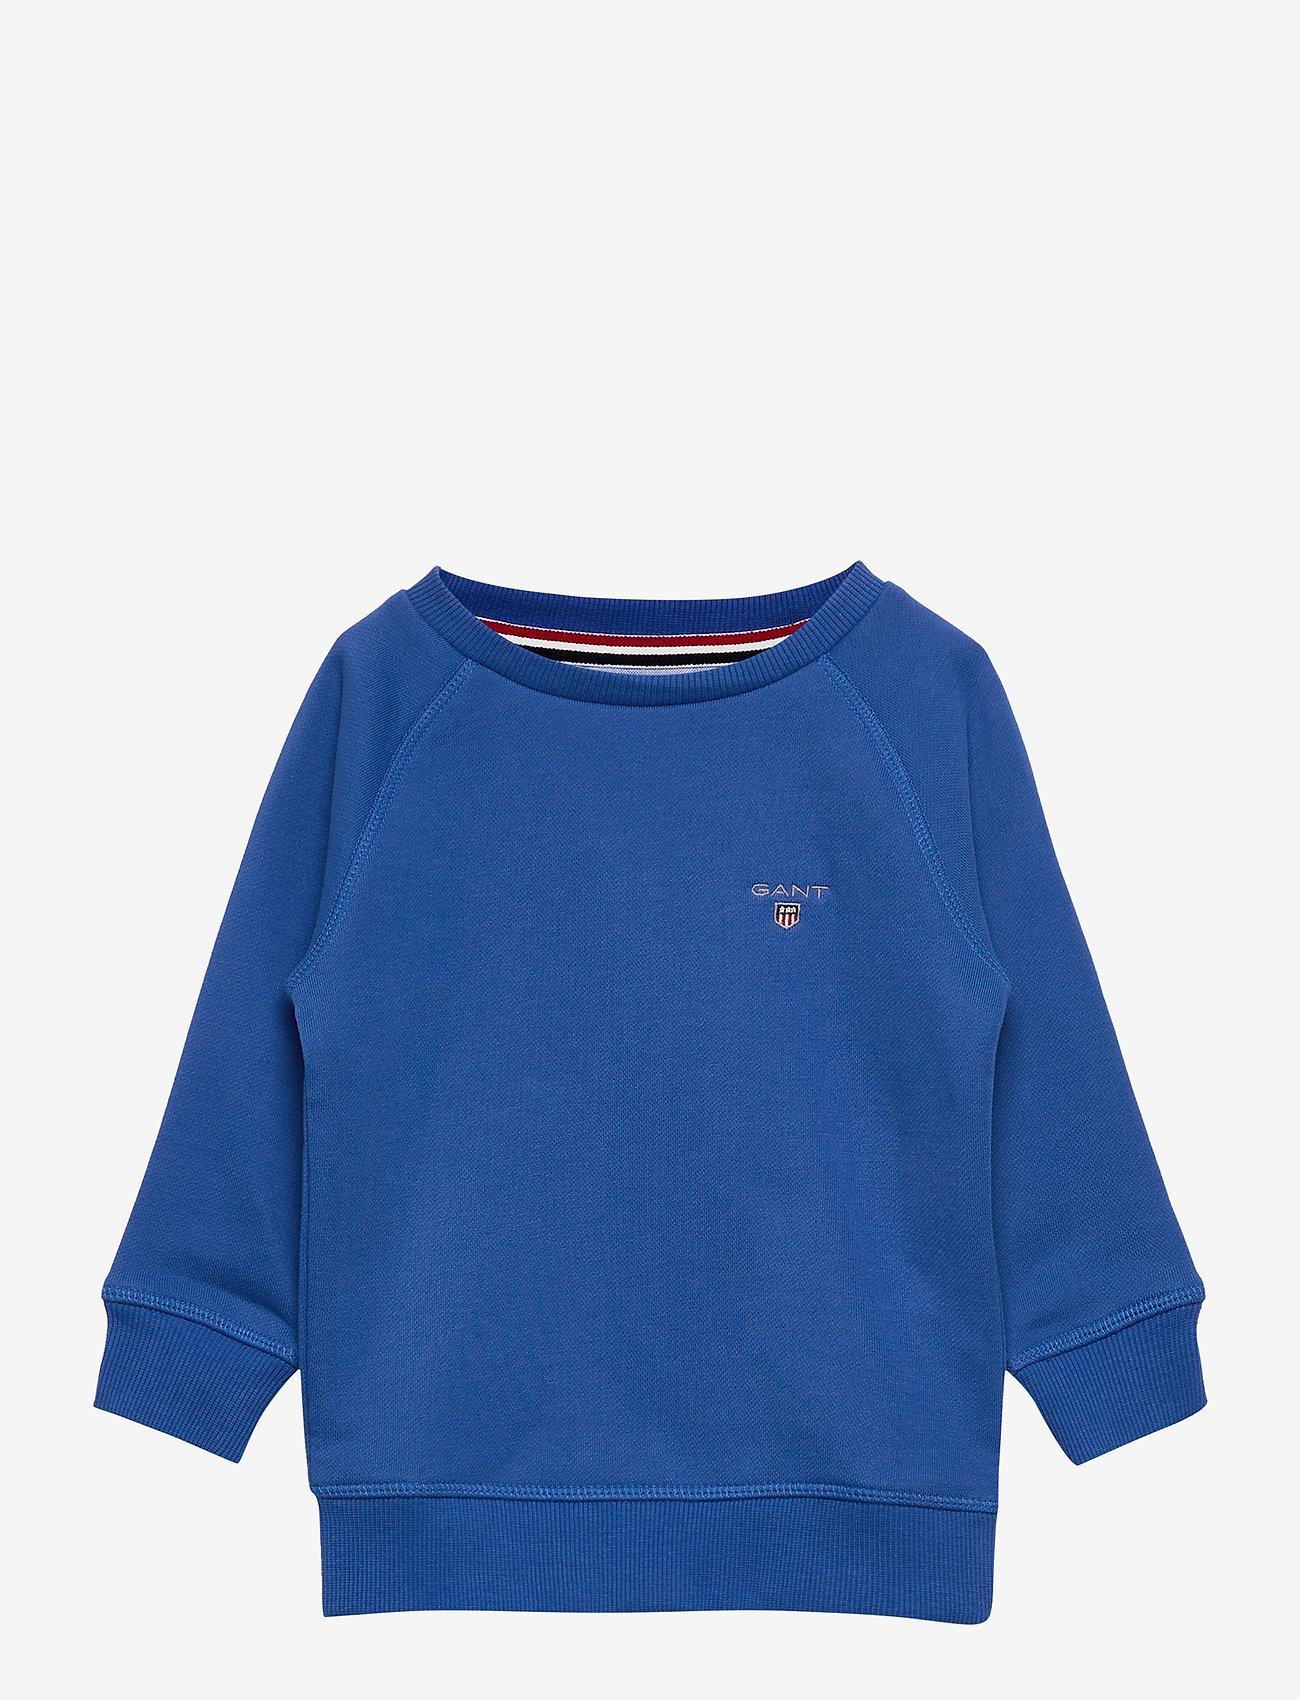 GANT - THE ORIGINAL SWEAT C-NECK - sweatshirts - strong blue - 0